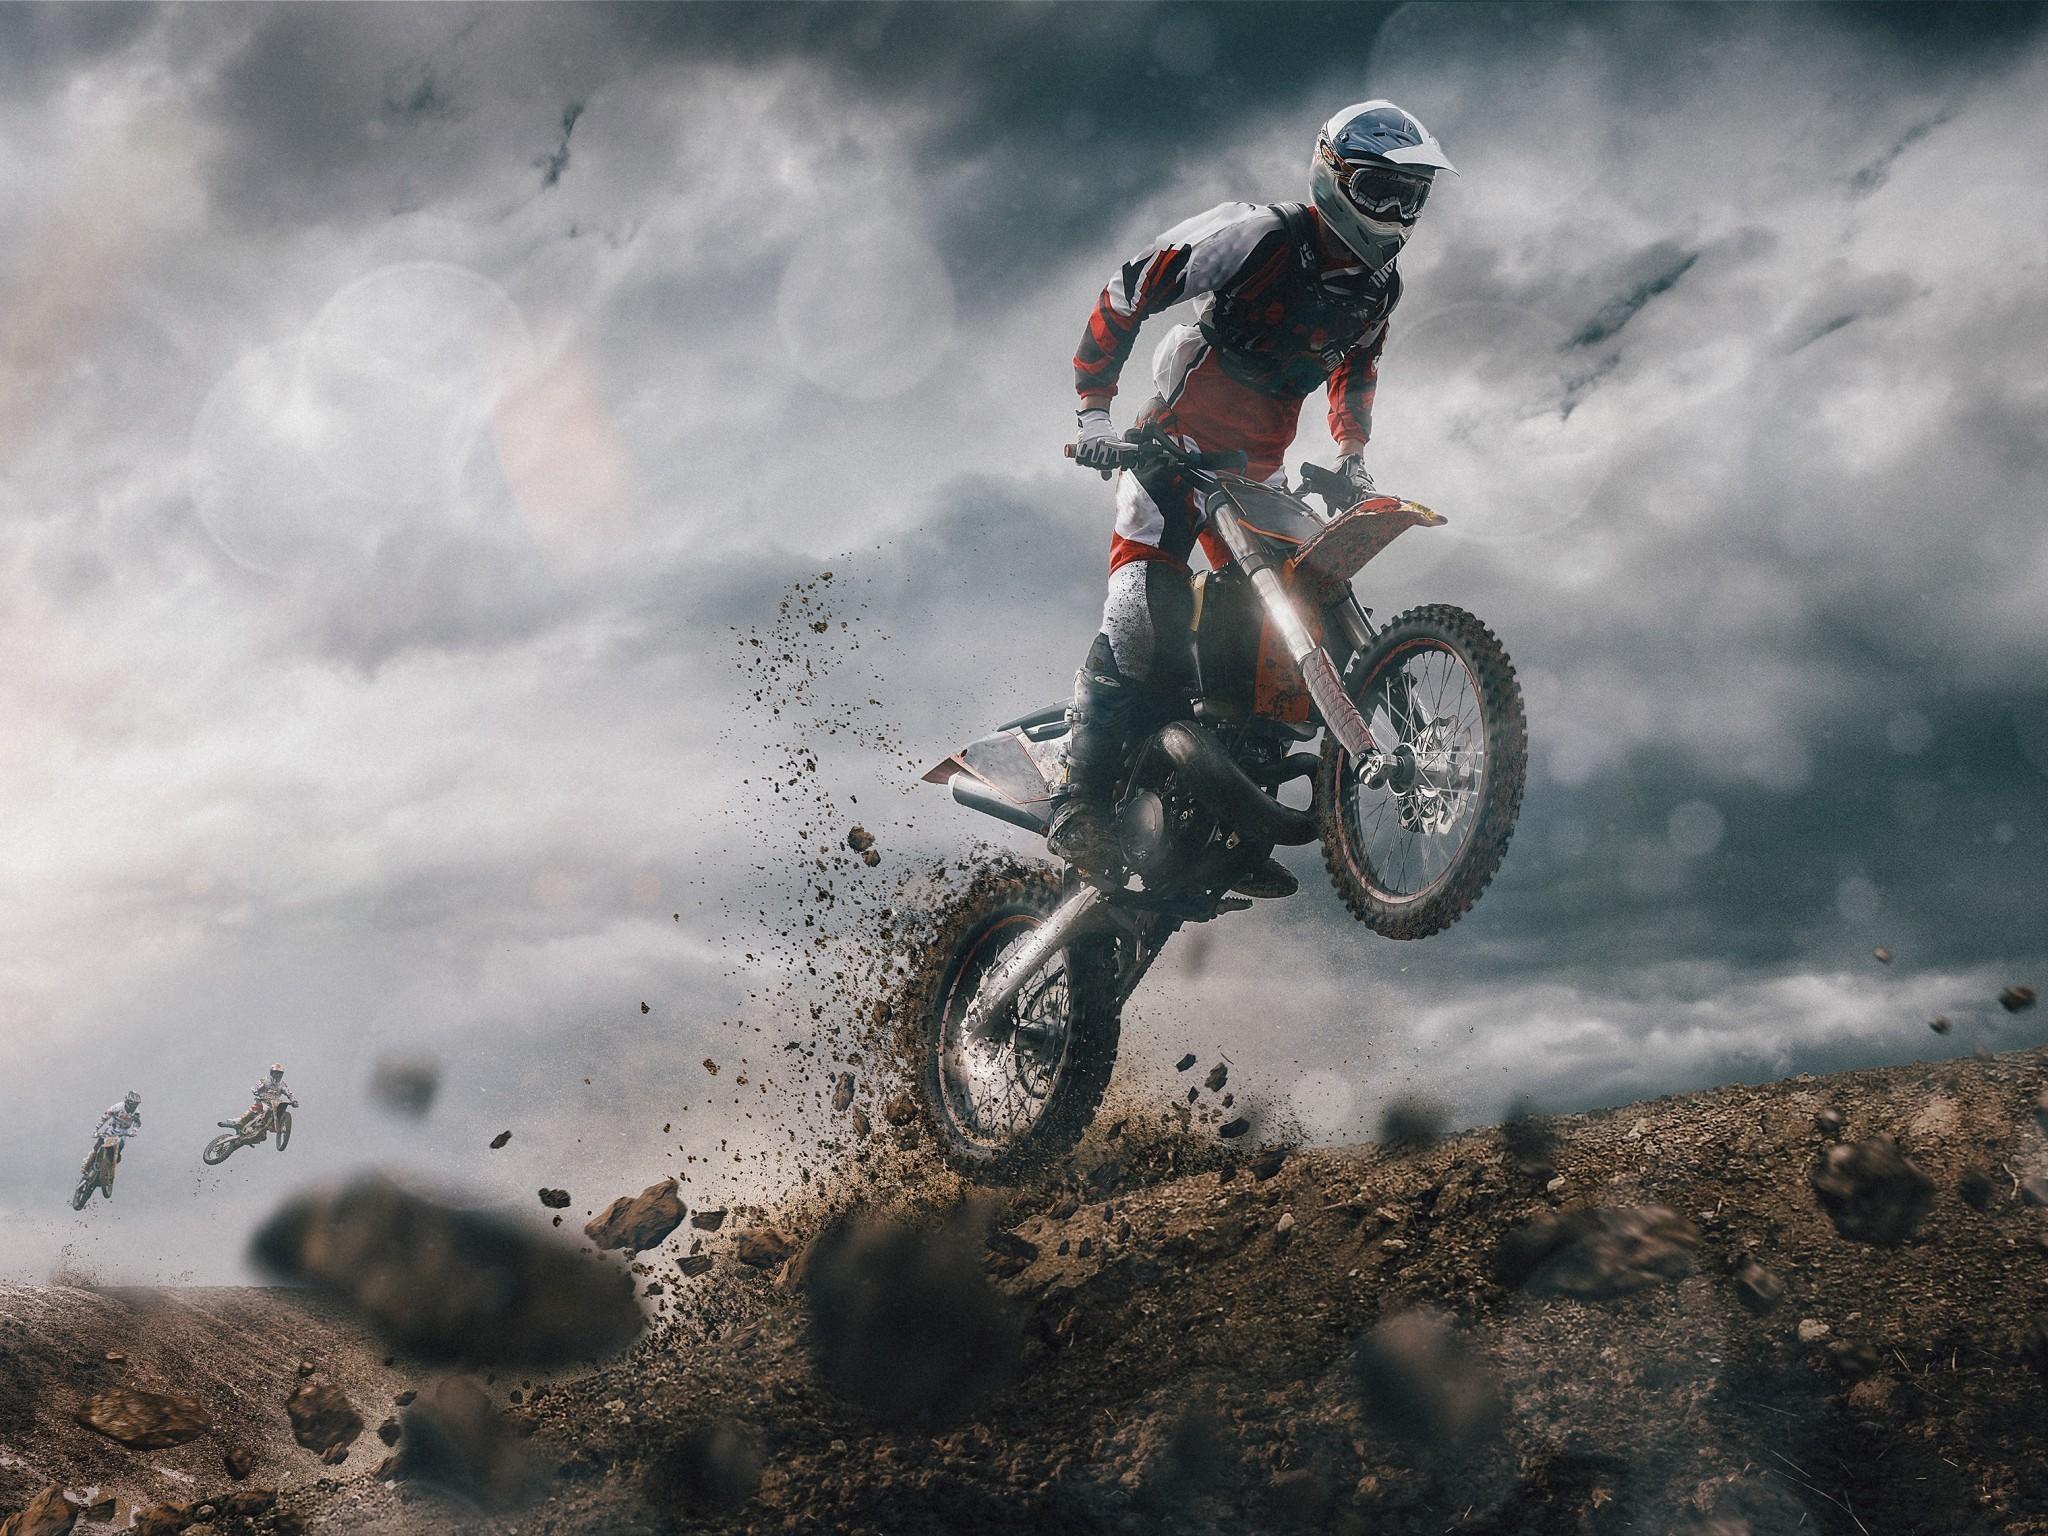 Res: 2048x1536, Motocross, Dirt, Dark Clouds